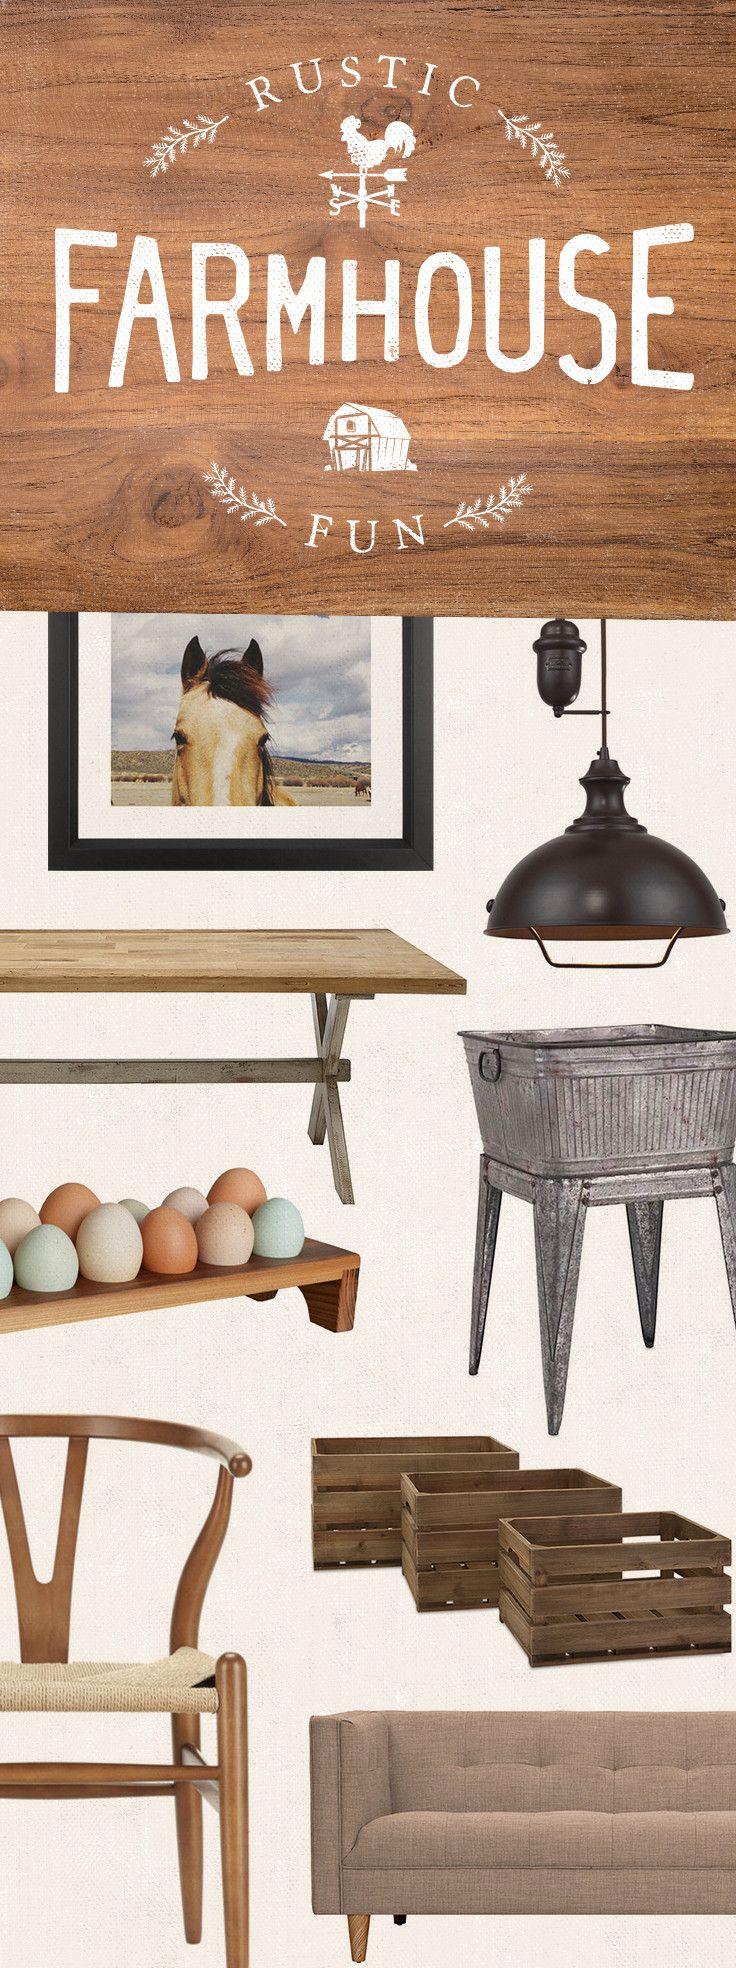 rustic farmhouse fun furniture collection dot bo new decorating ideas. Black Bedroom Furniture Sets. Home Design Ideas